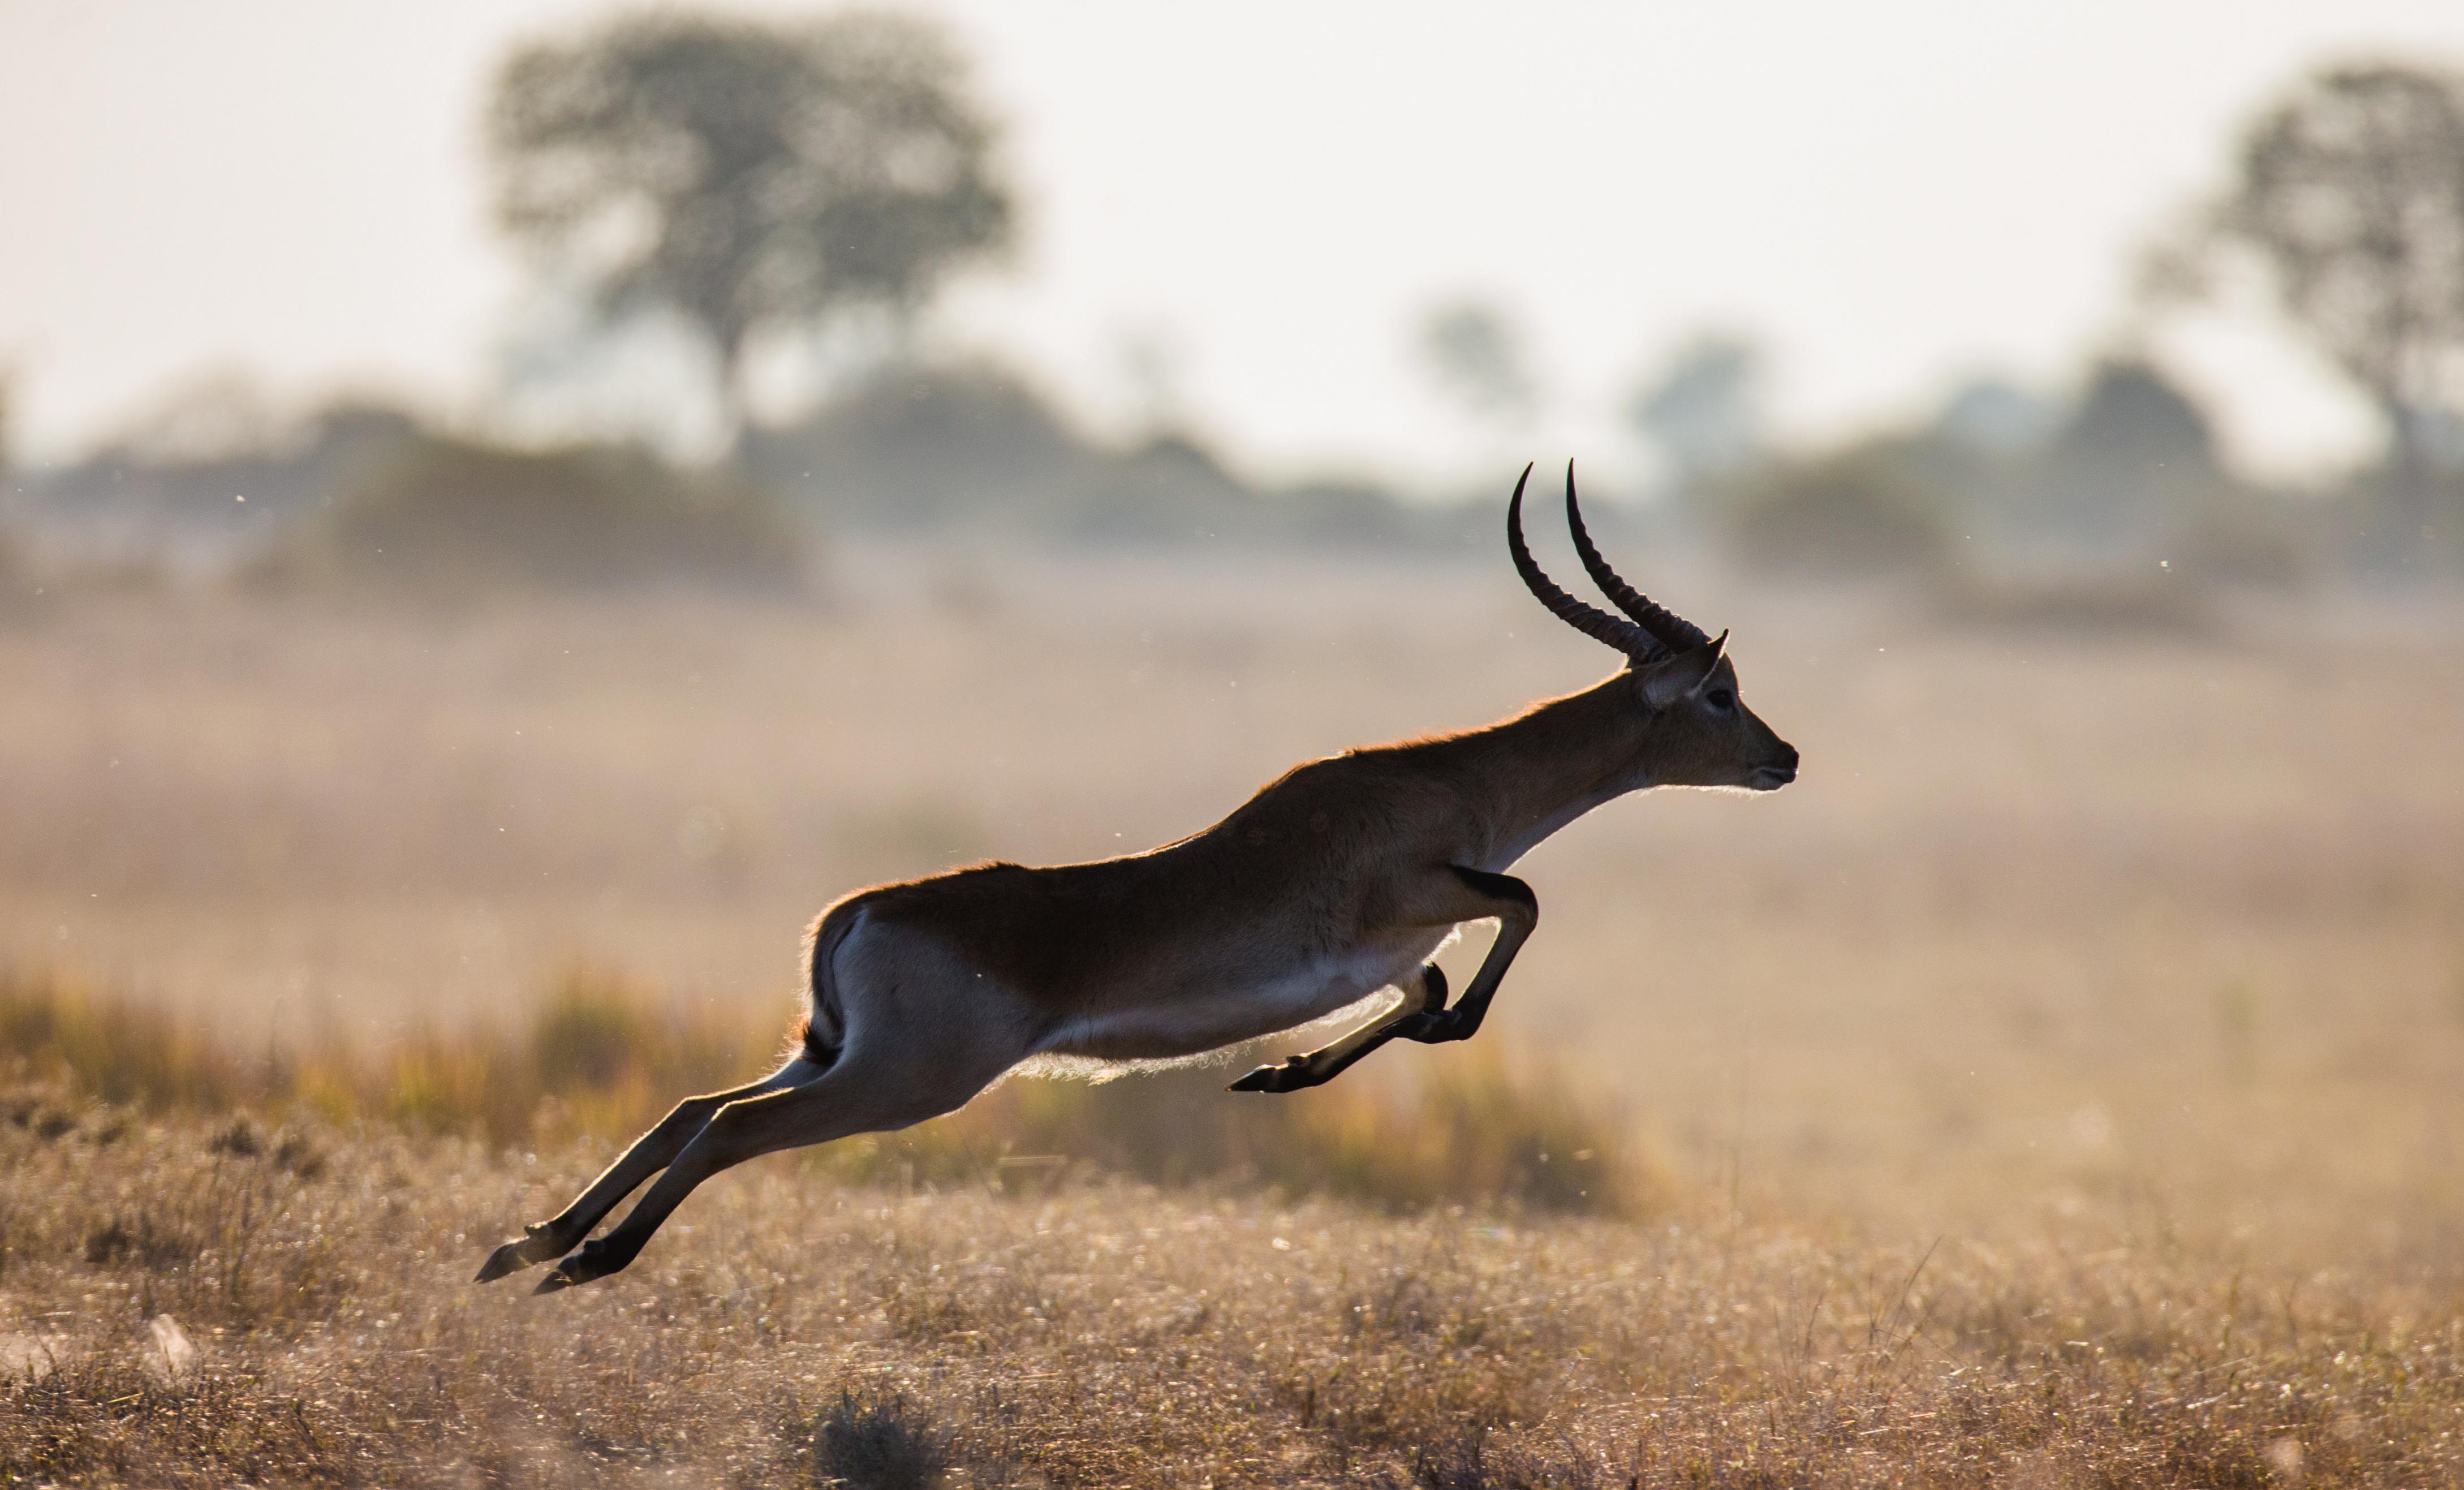 gazelle animal running